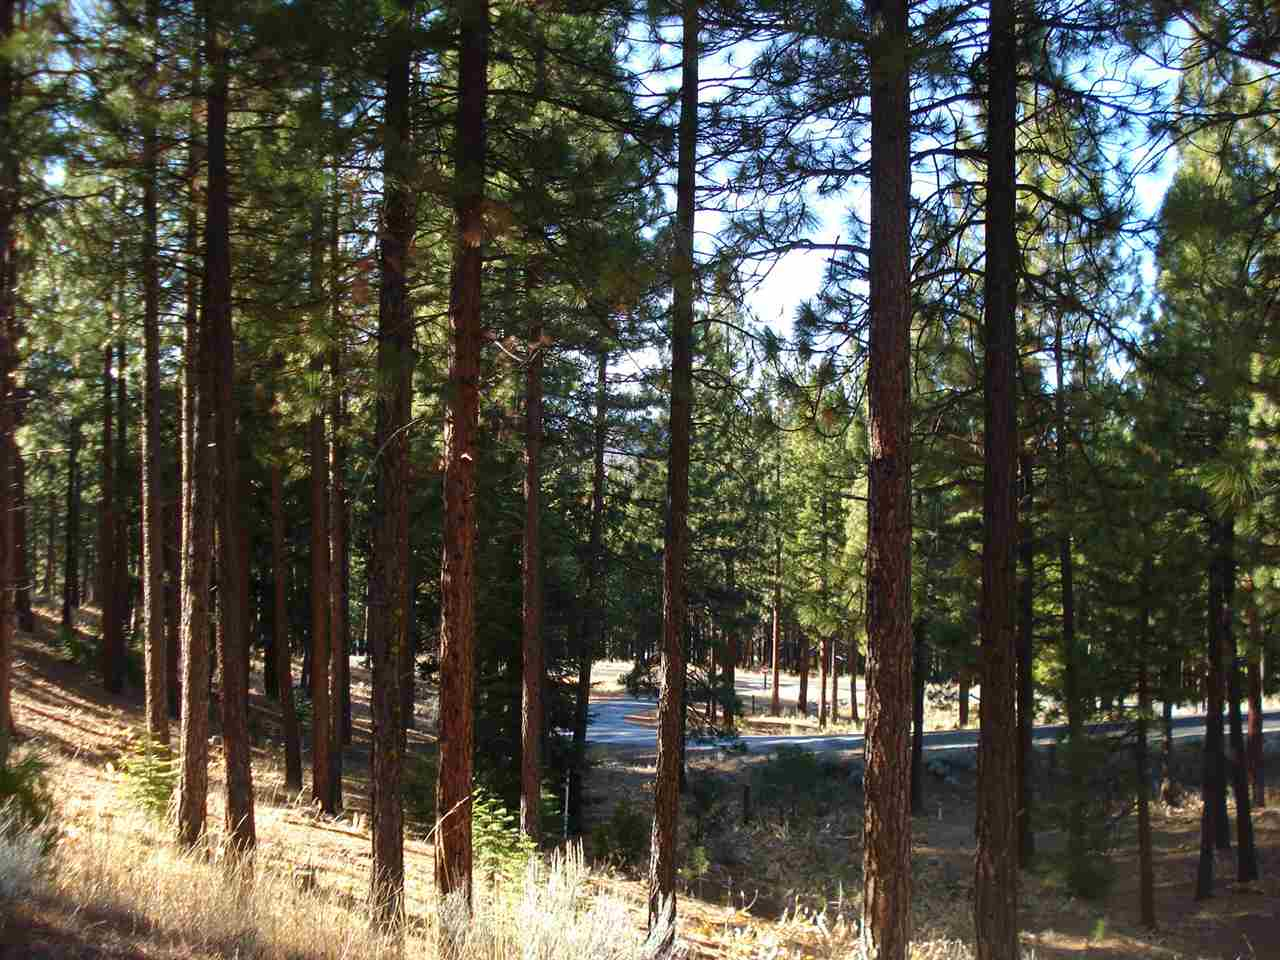 Image for 59 Whisker Brush Way, Portola, CA 96122